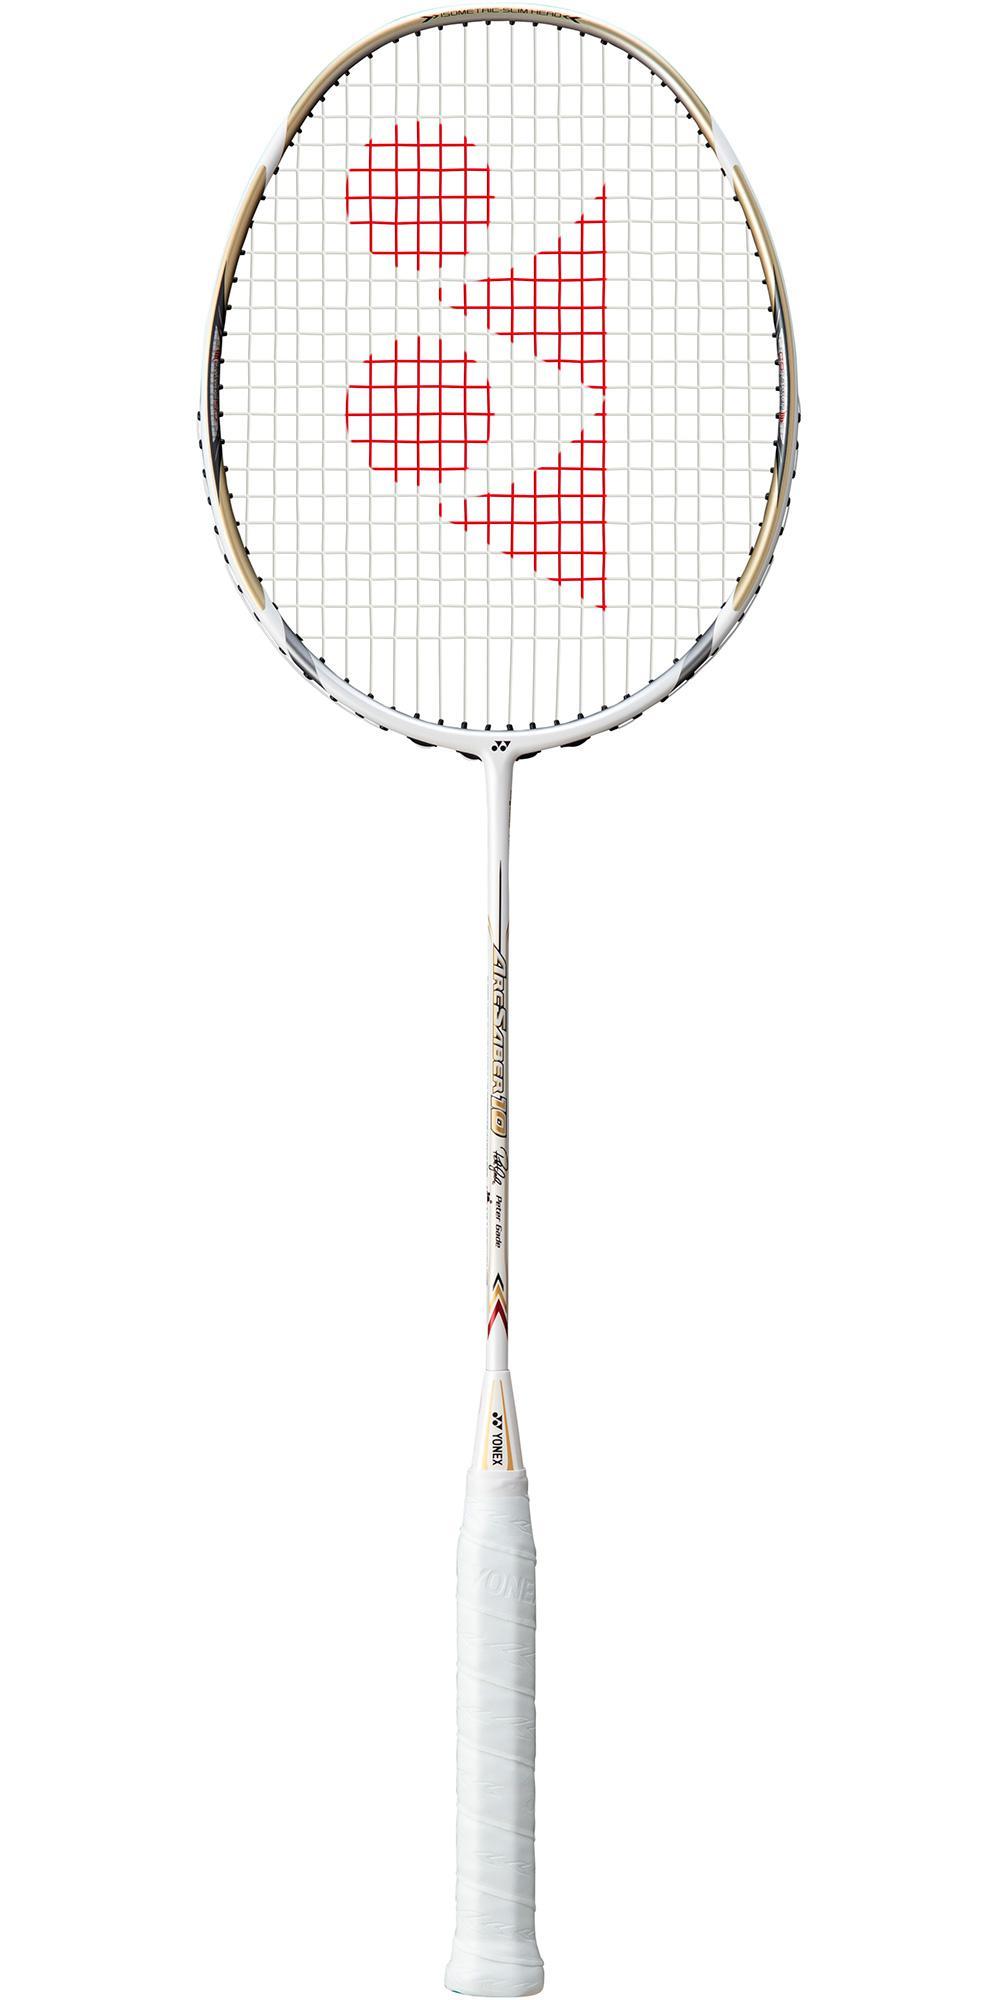 Yonex Arcsaber 10 Legends Vision Peter Gade Badminton